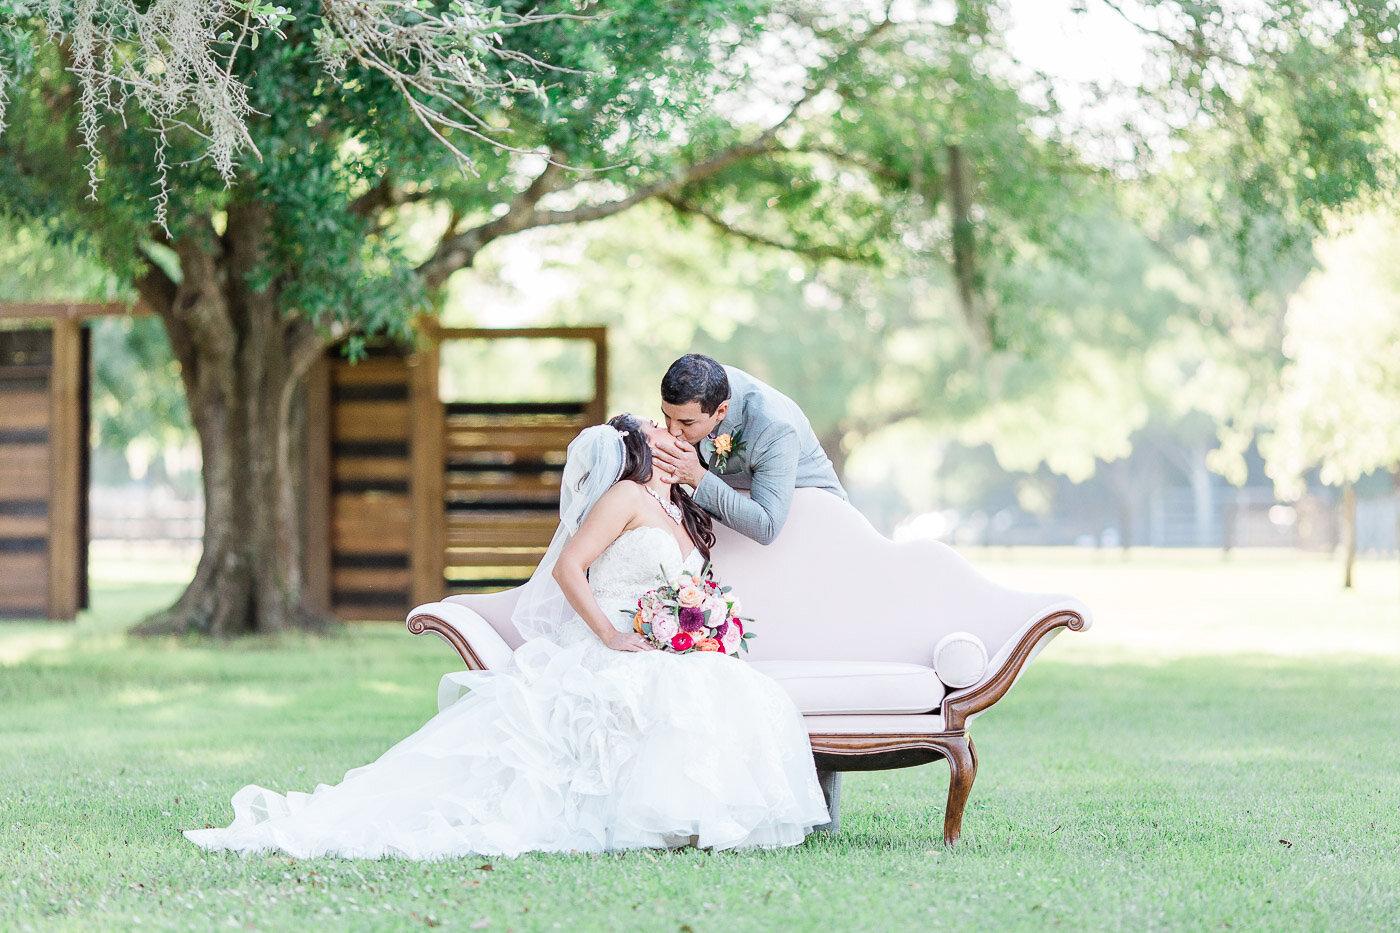 Lakeland-barn-wedding-at-white-horse-ranch-59.jpg